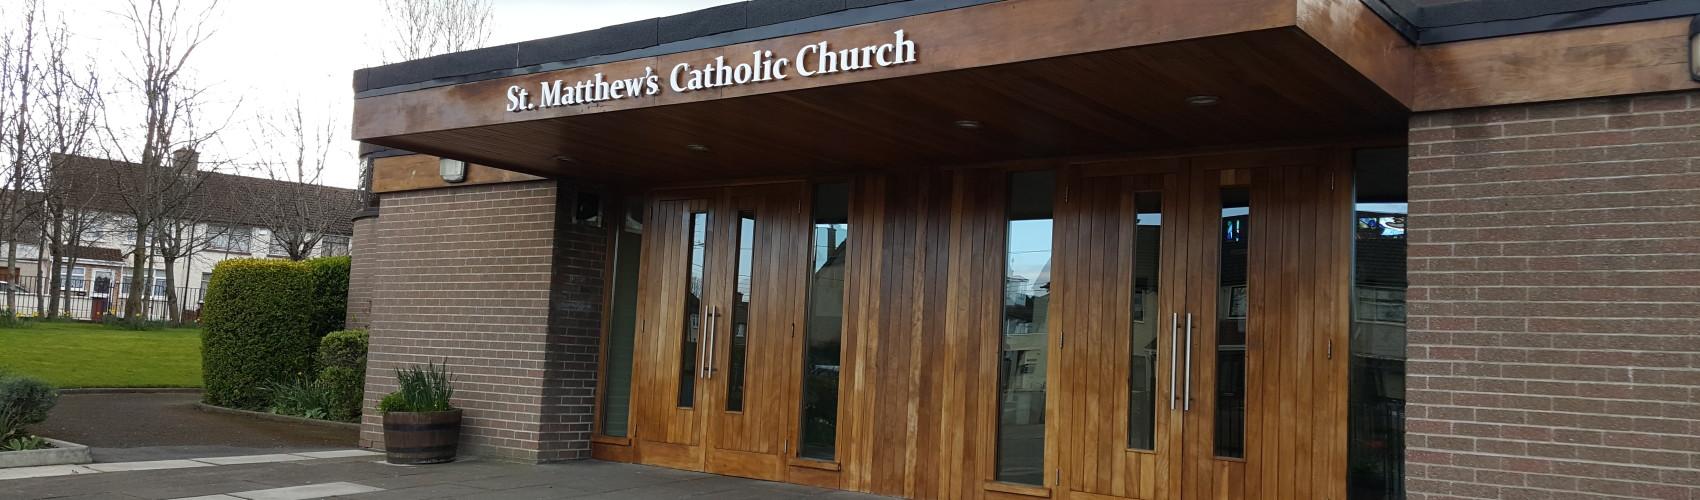 saint matthews dating site 1000s of saint matthews women dating personals signup free and start meeting local saint matthews women on bookofmatchescom.